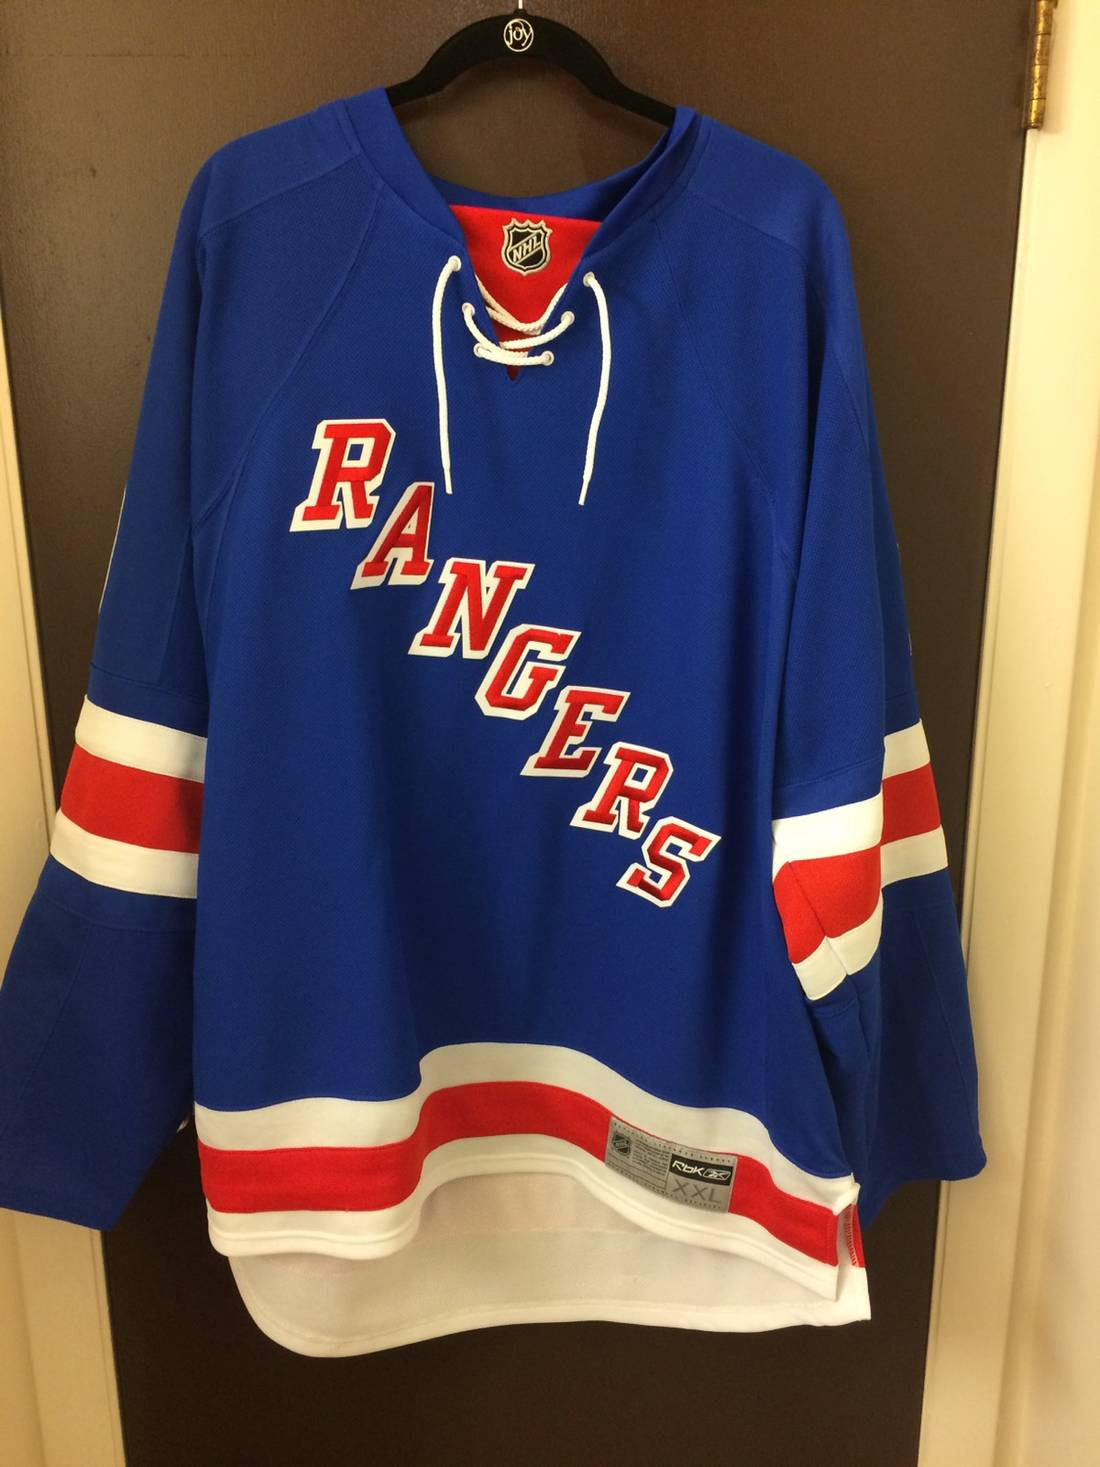 ... Reebok Reebok New York Rangers Jersey Size US XXL EU 58 5 . 233dbdde4